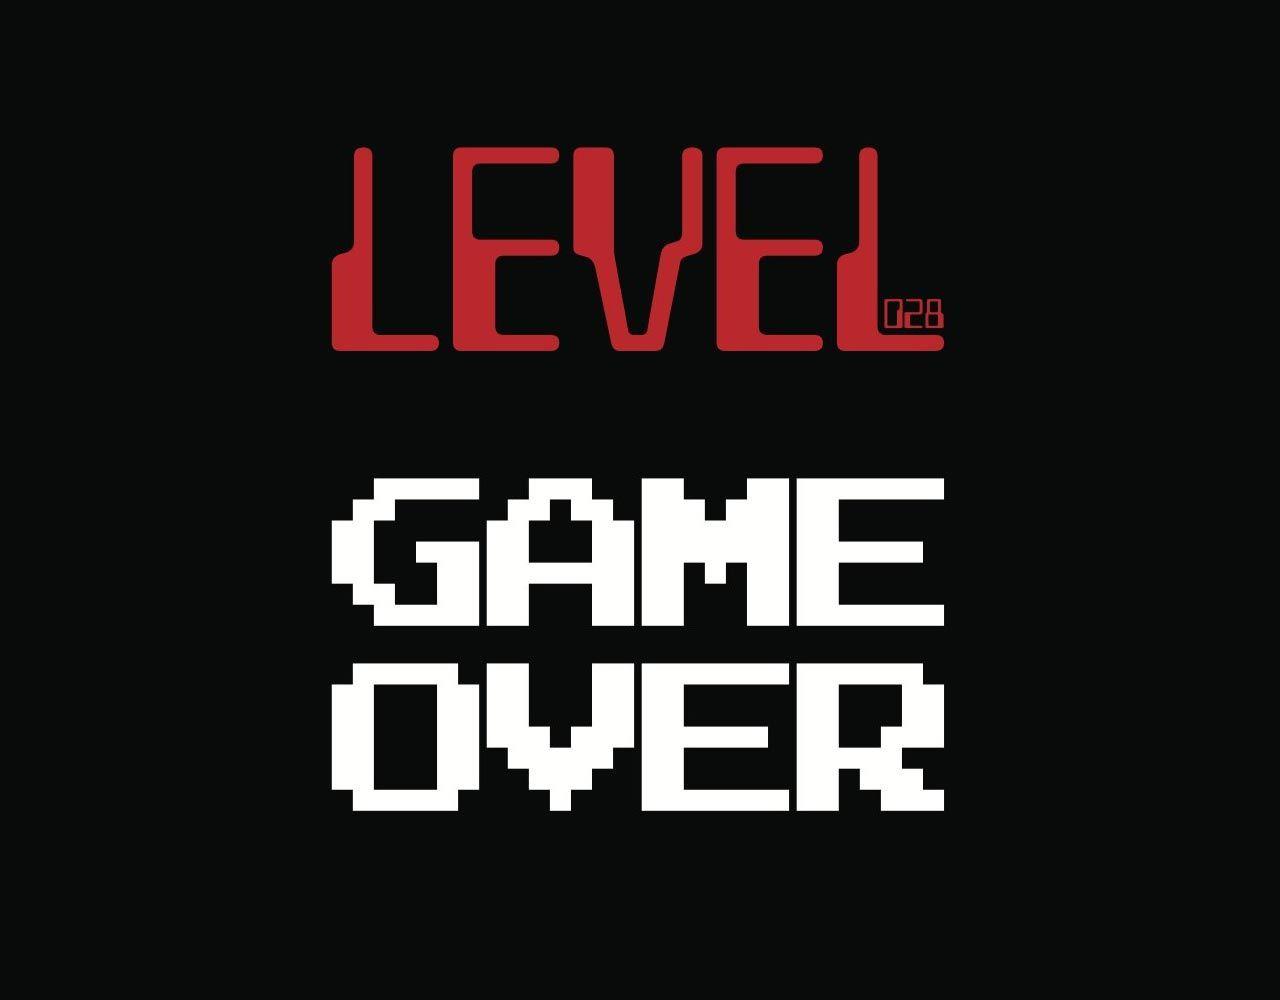 Spelmagasinet Level lägger ner